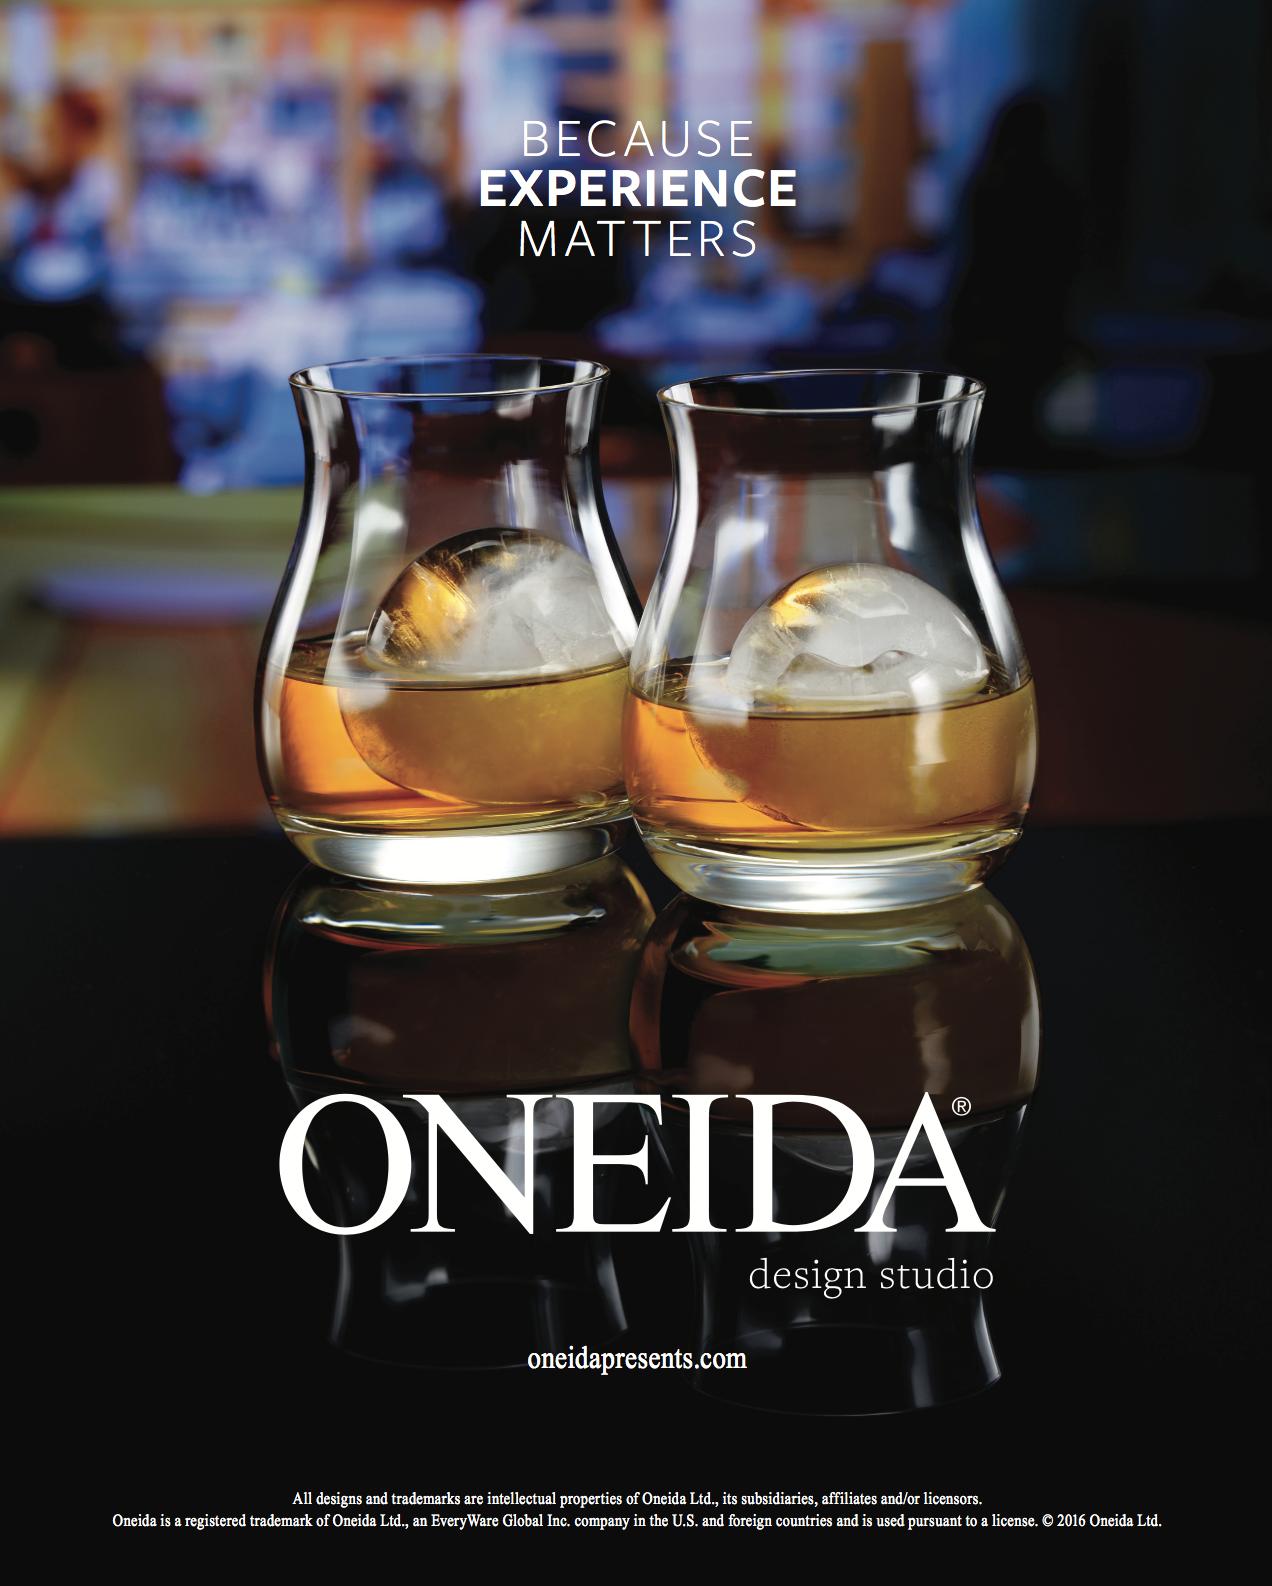 Cocktails in oneida glasses